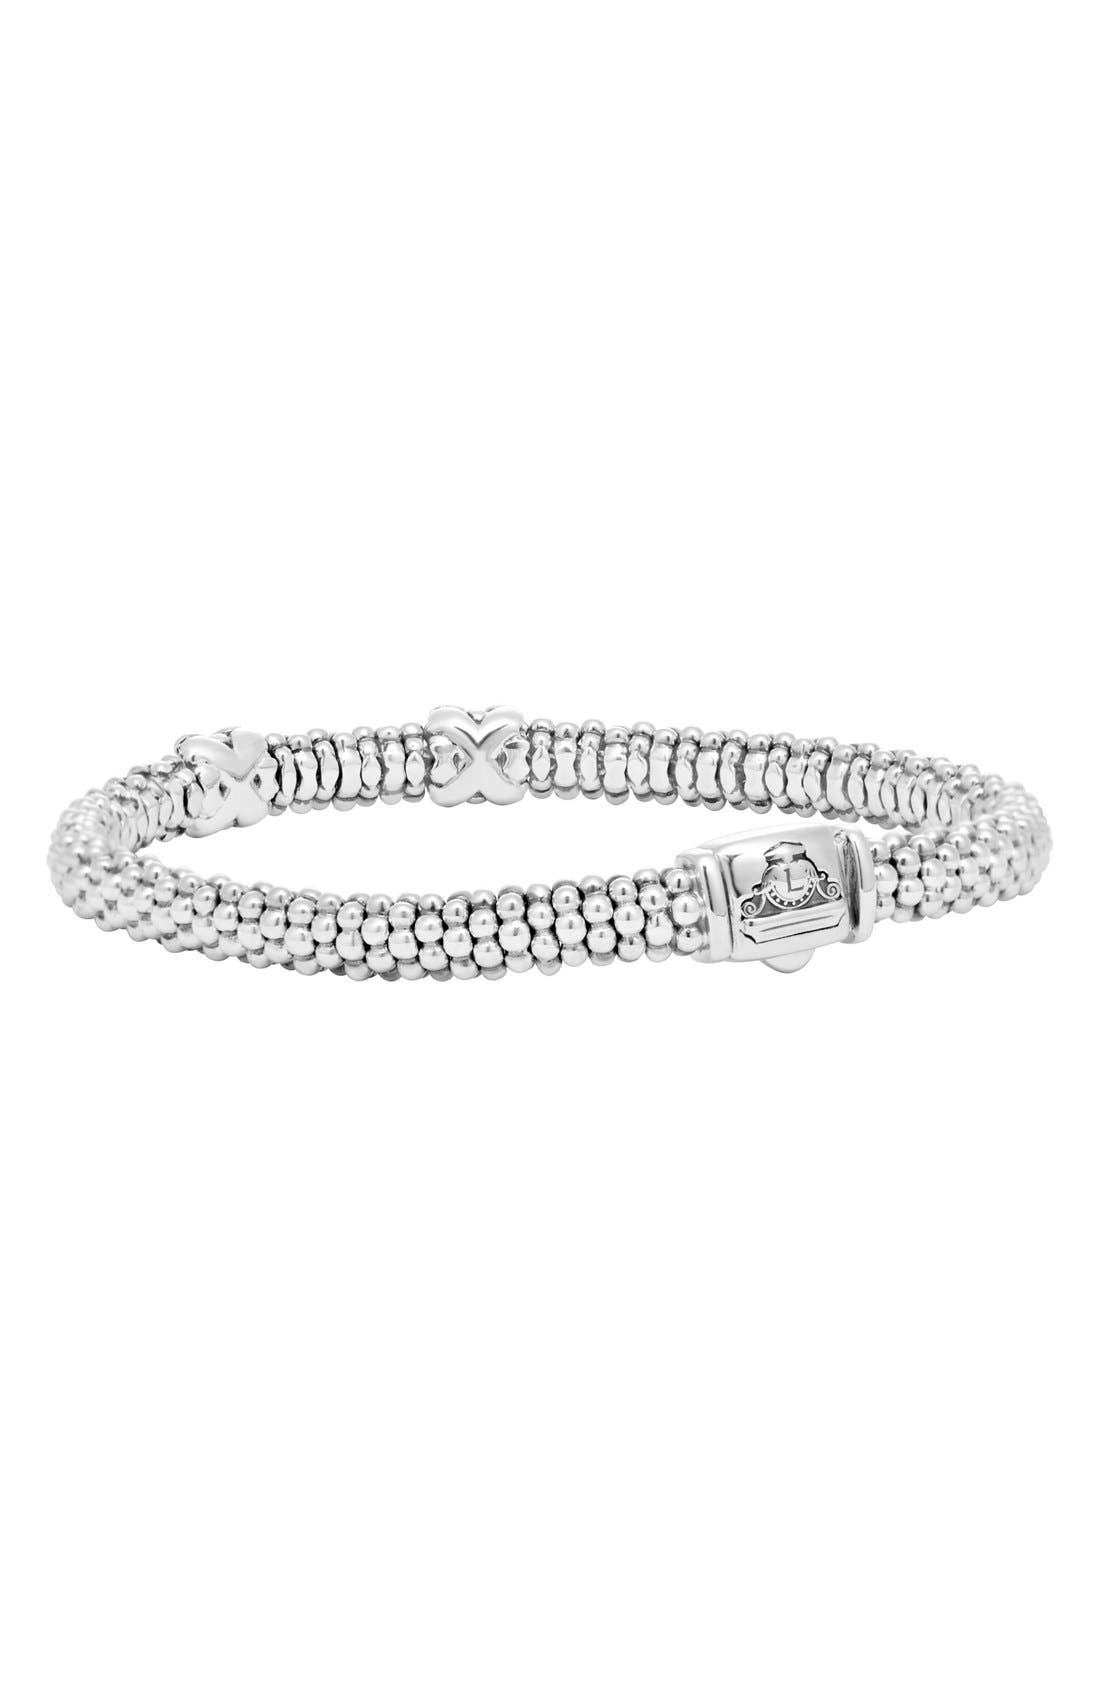 Alternate Image 2  - Lagos 'Signature Caviar' Diamond Rope Bracelet (Online Only)